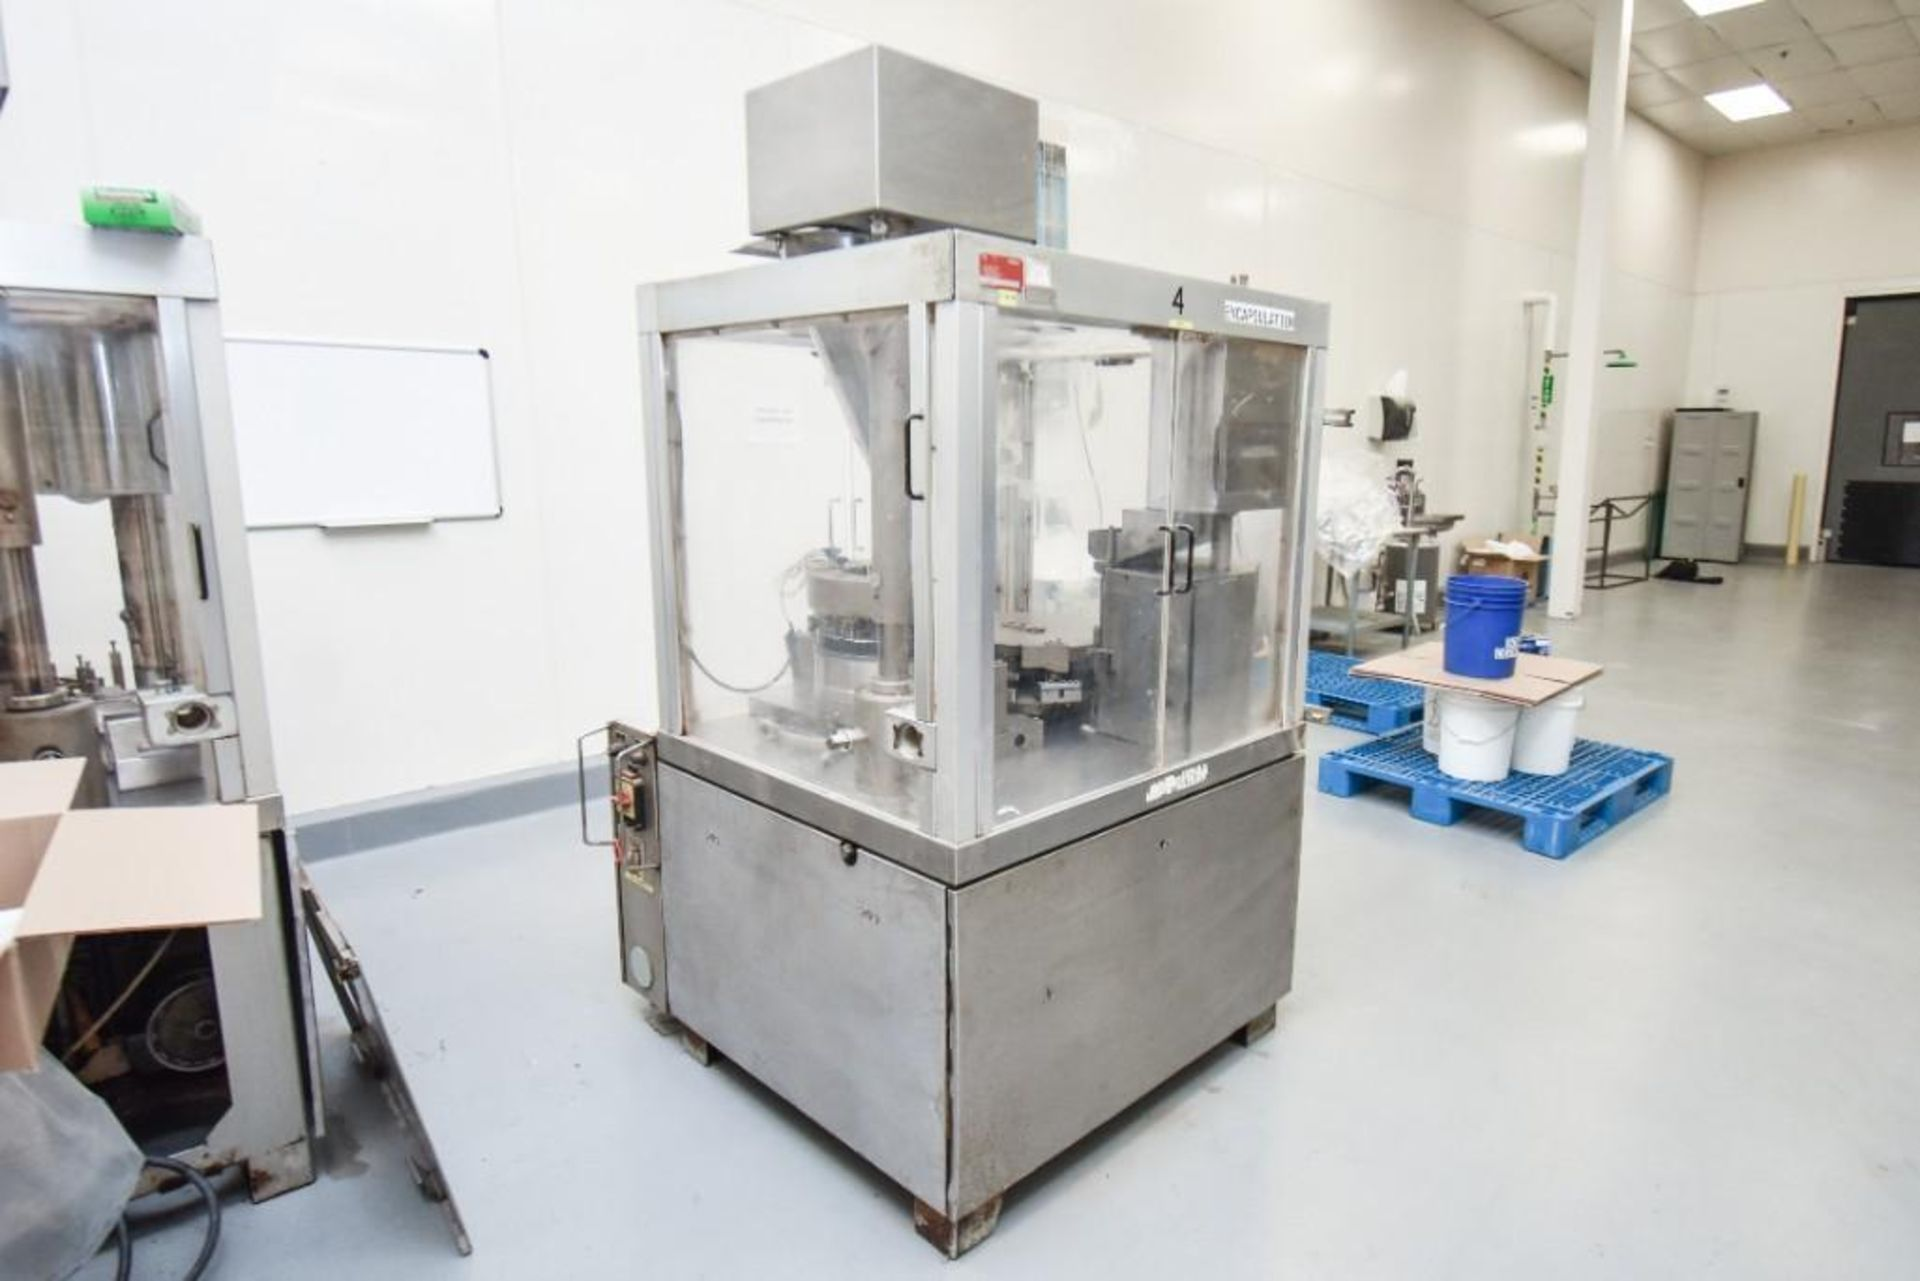 GFK 1500 Bosch Encapsulation Machine - Image 6 of 11